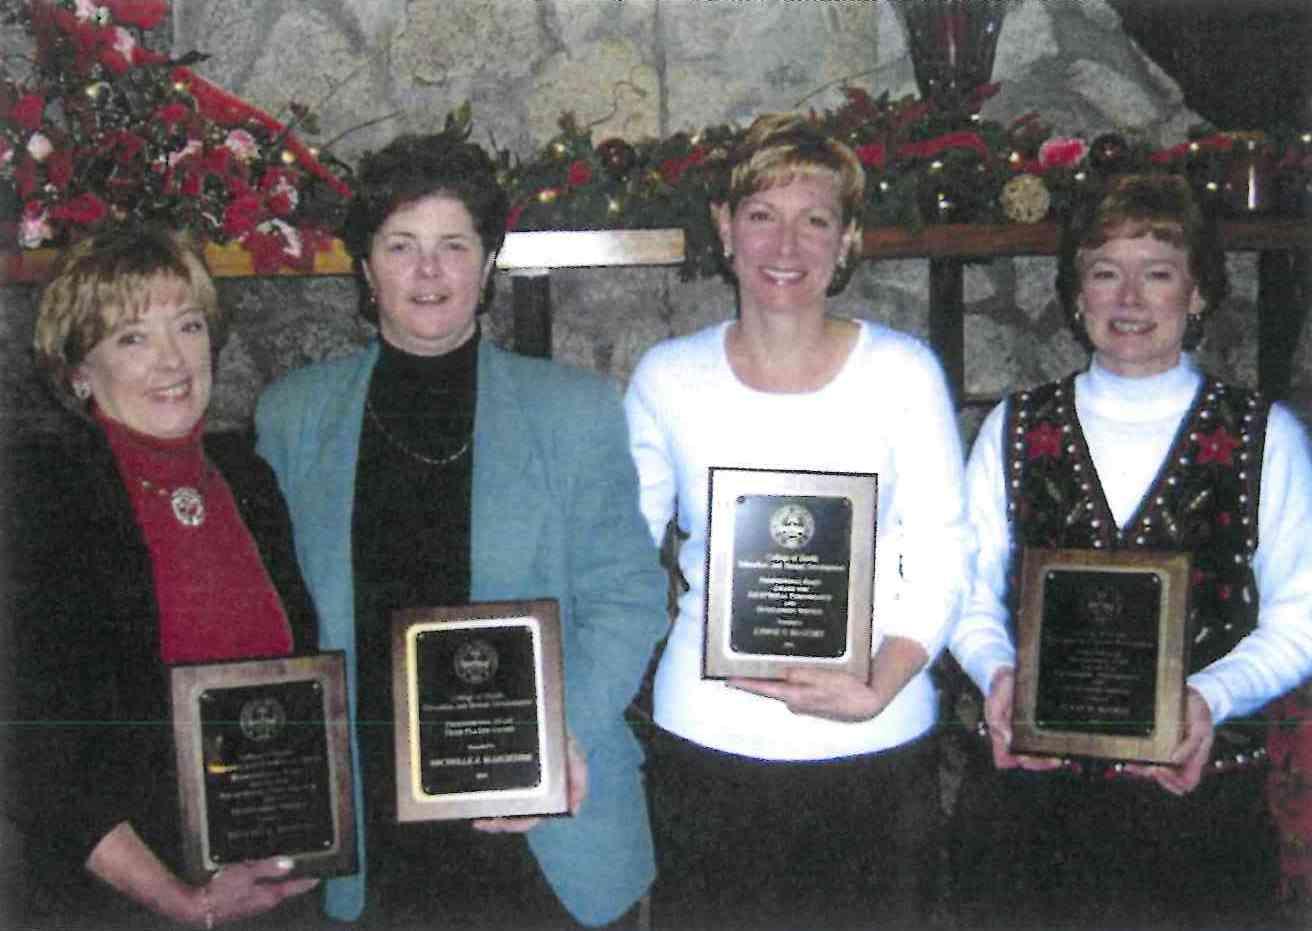 (from left) Beverly Brosnan, Michelle Marchesse, Lynne McGuirt, Susan McGhee